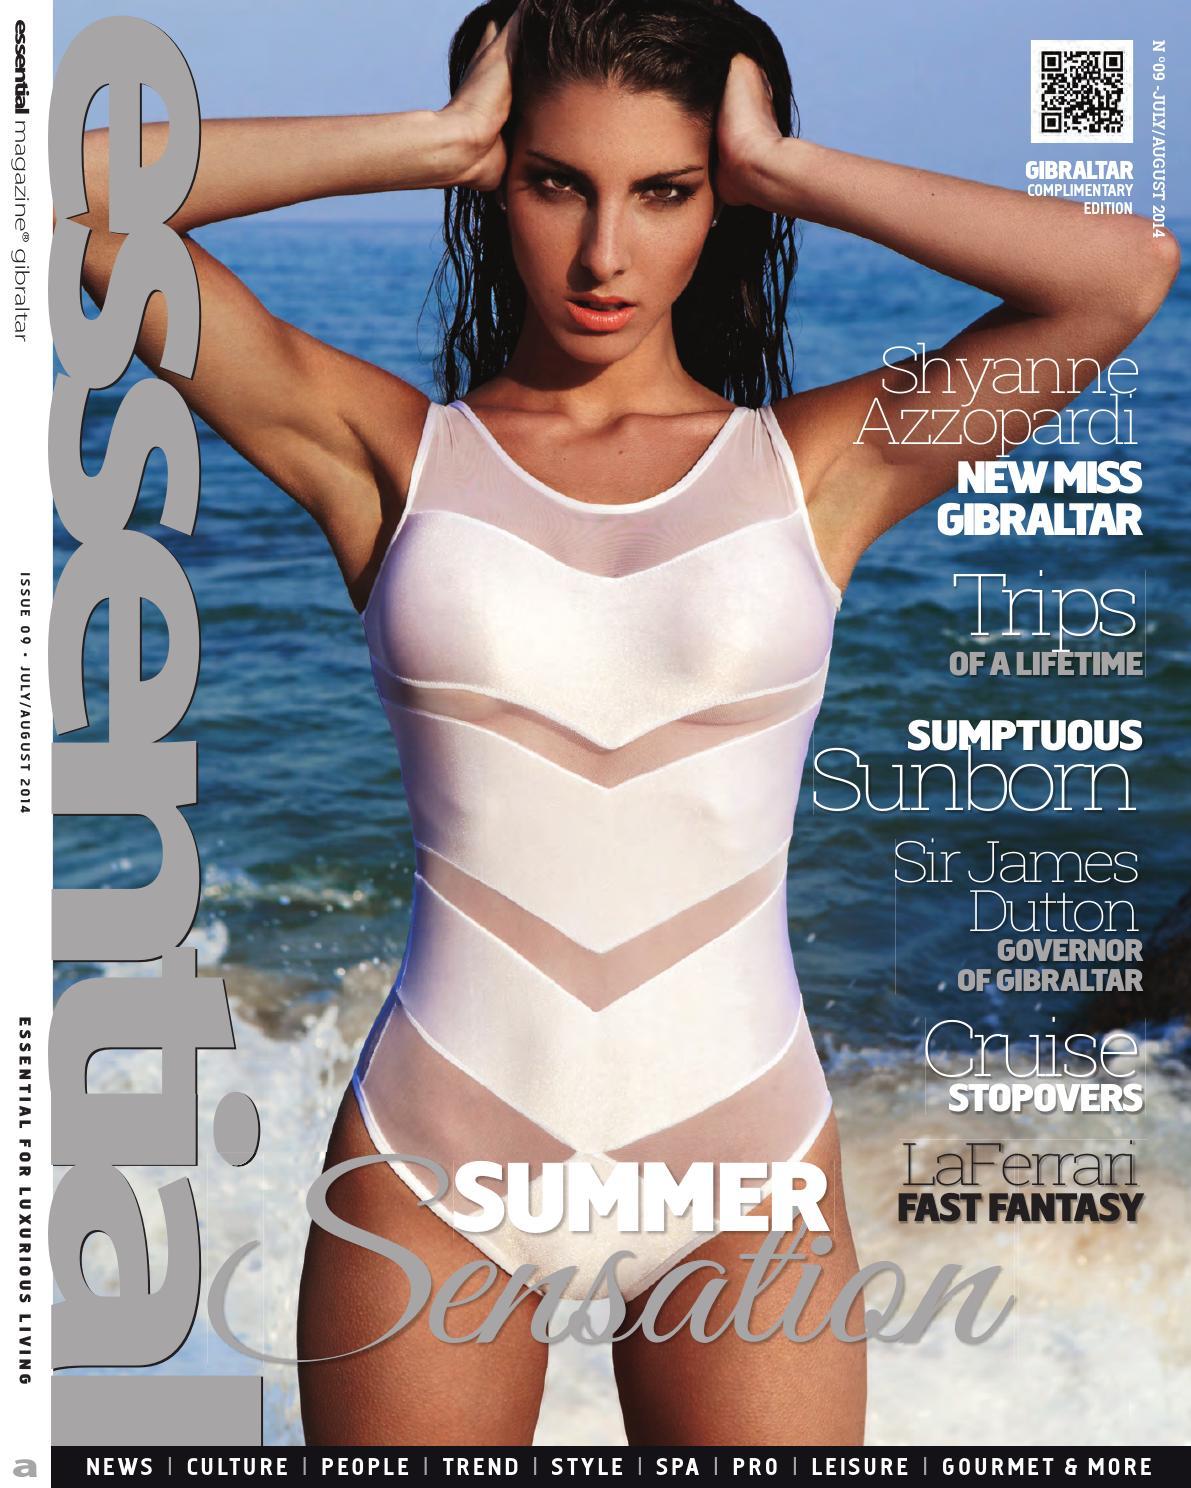 Amy Dumas Sexy essential gibraltar july 2014publicaciones